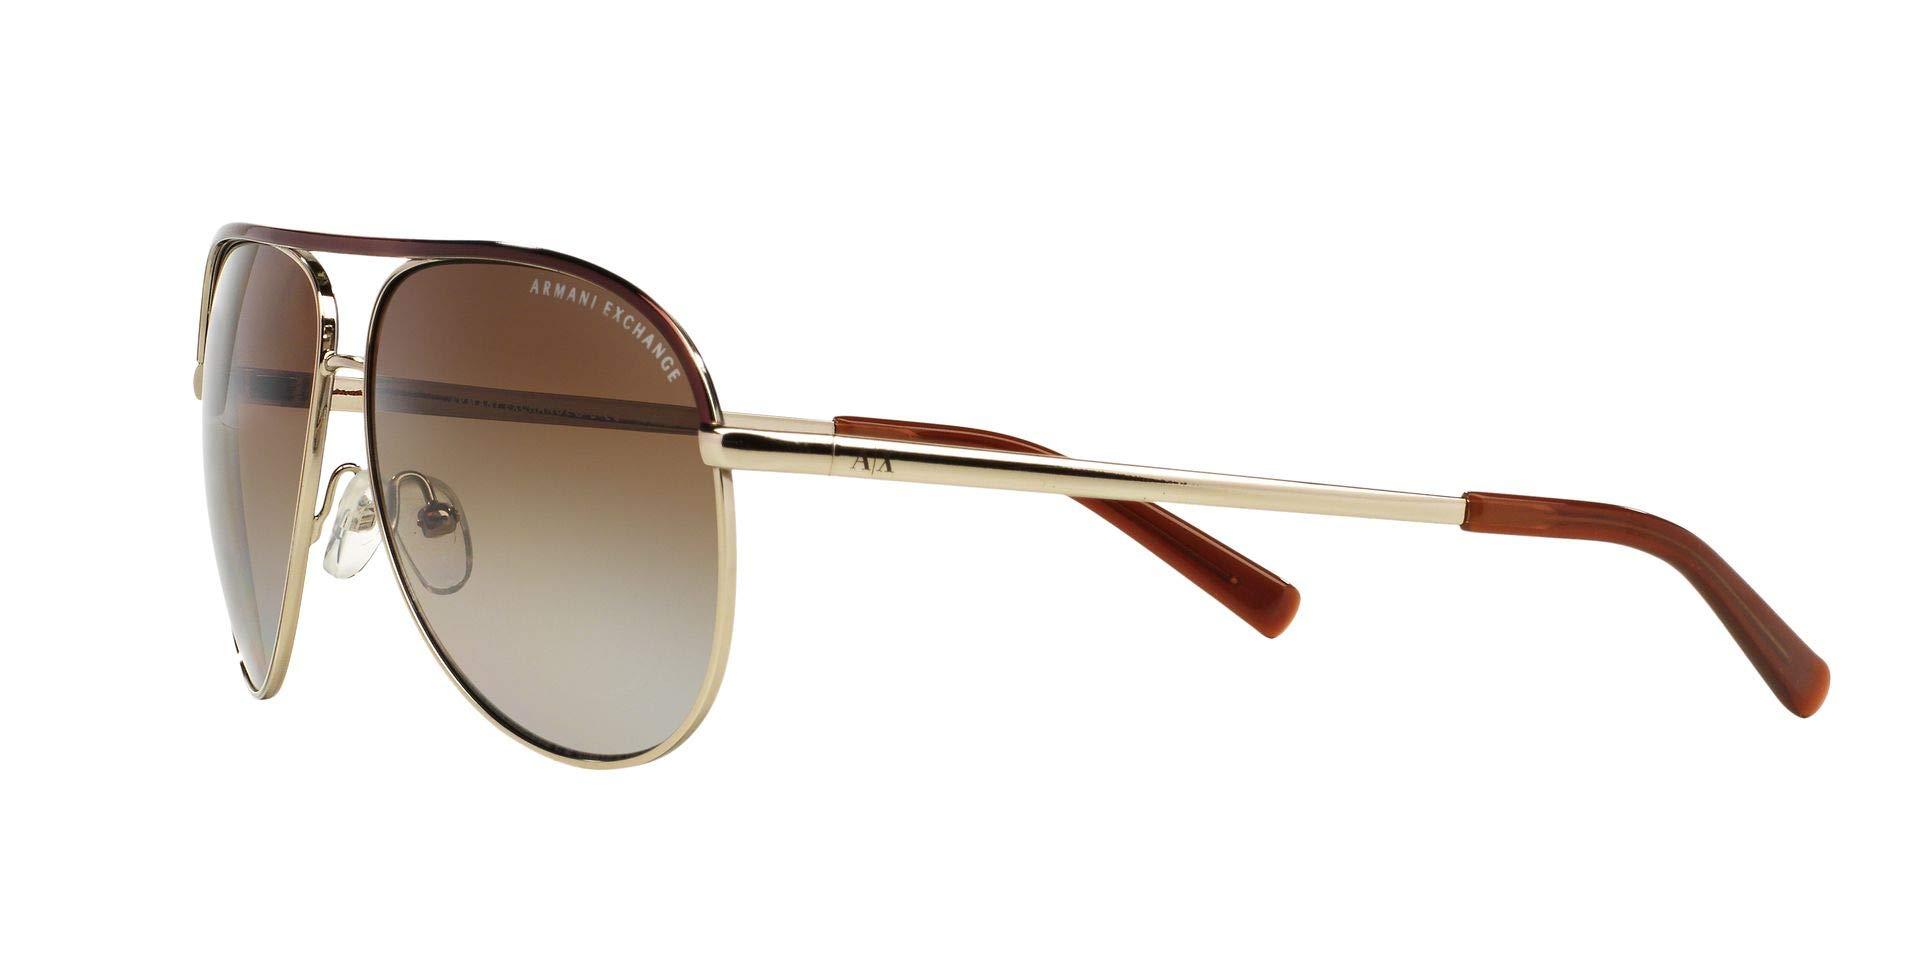 Armani Exchange Metal Unisex Polarized Aviator Sunglasses, Light Gold/Dark Brown, 61 mm by A|X Armani Exchange (Image #4)